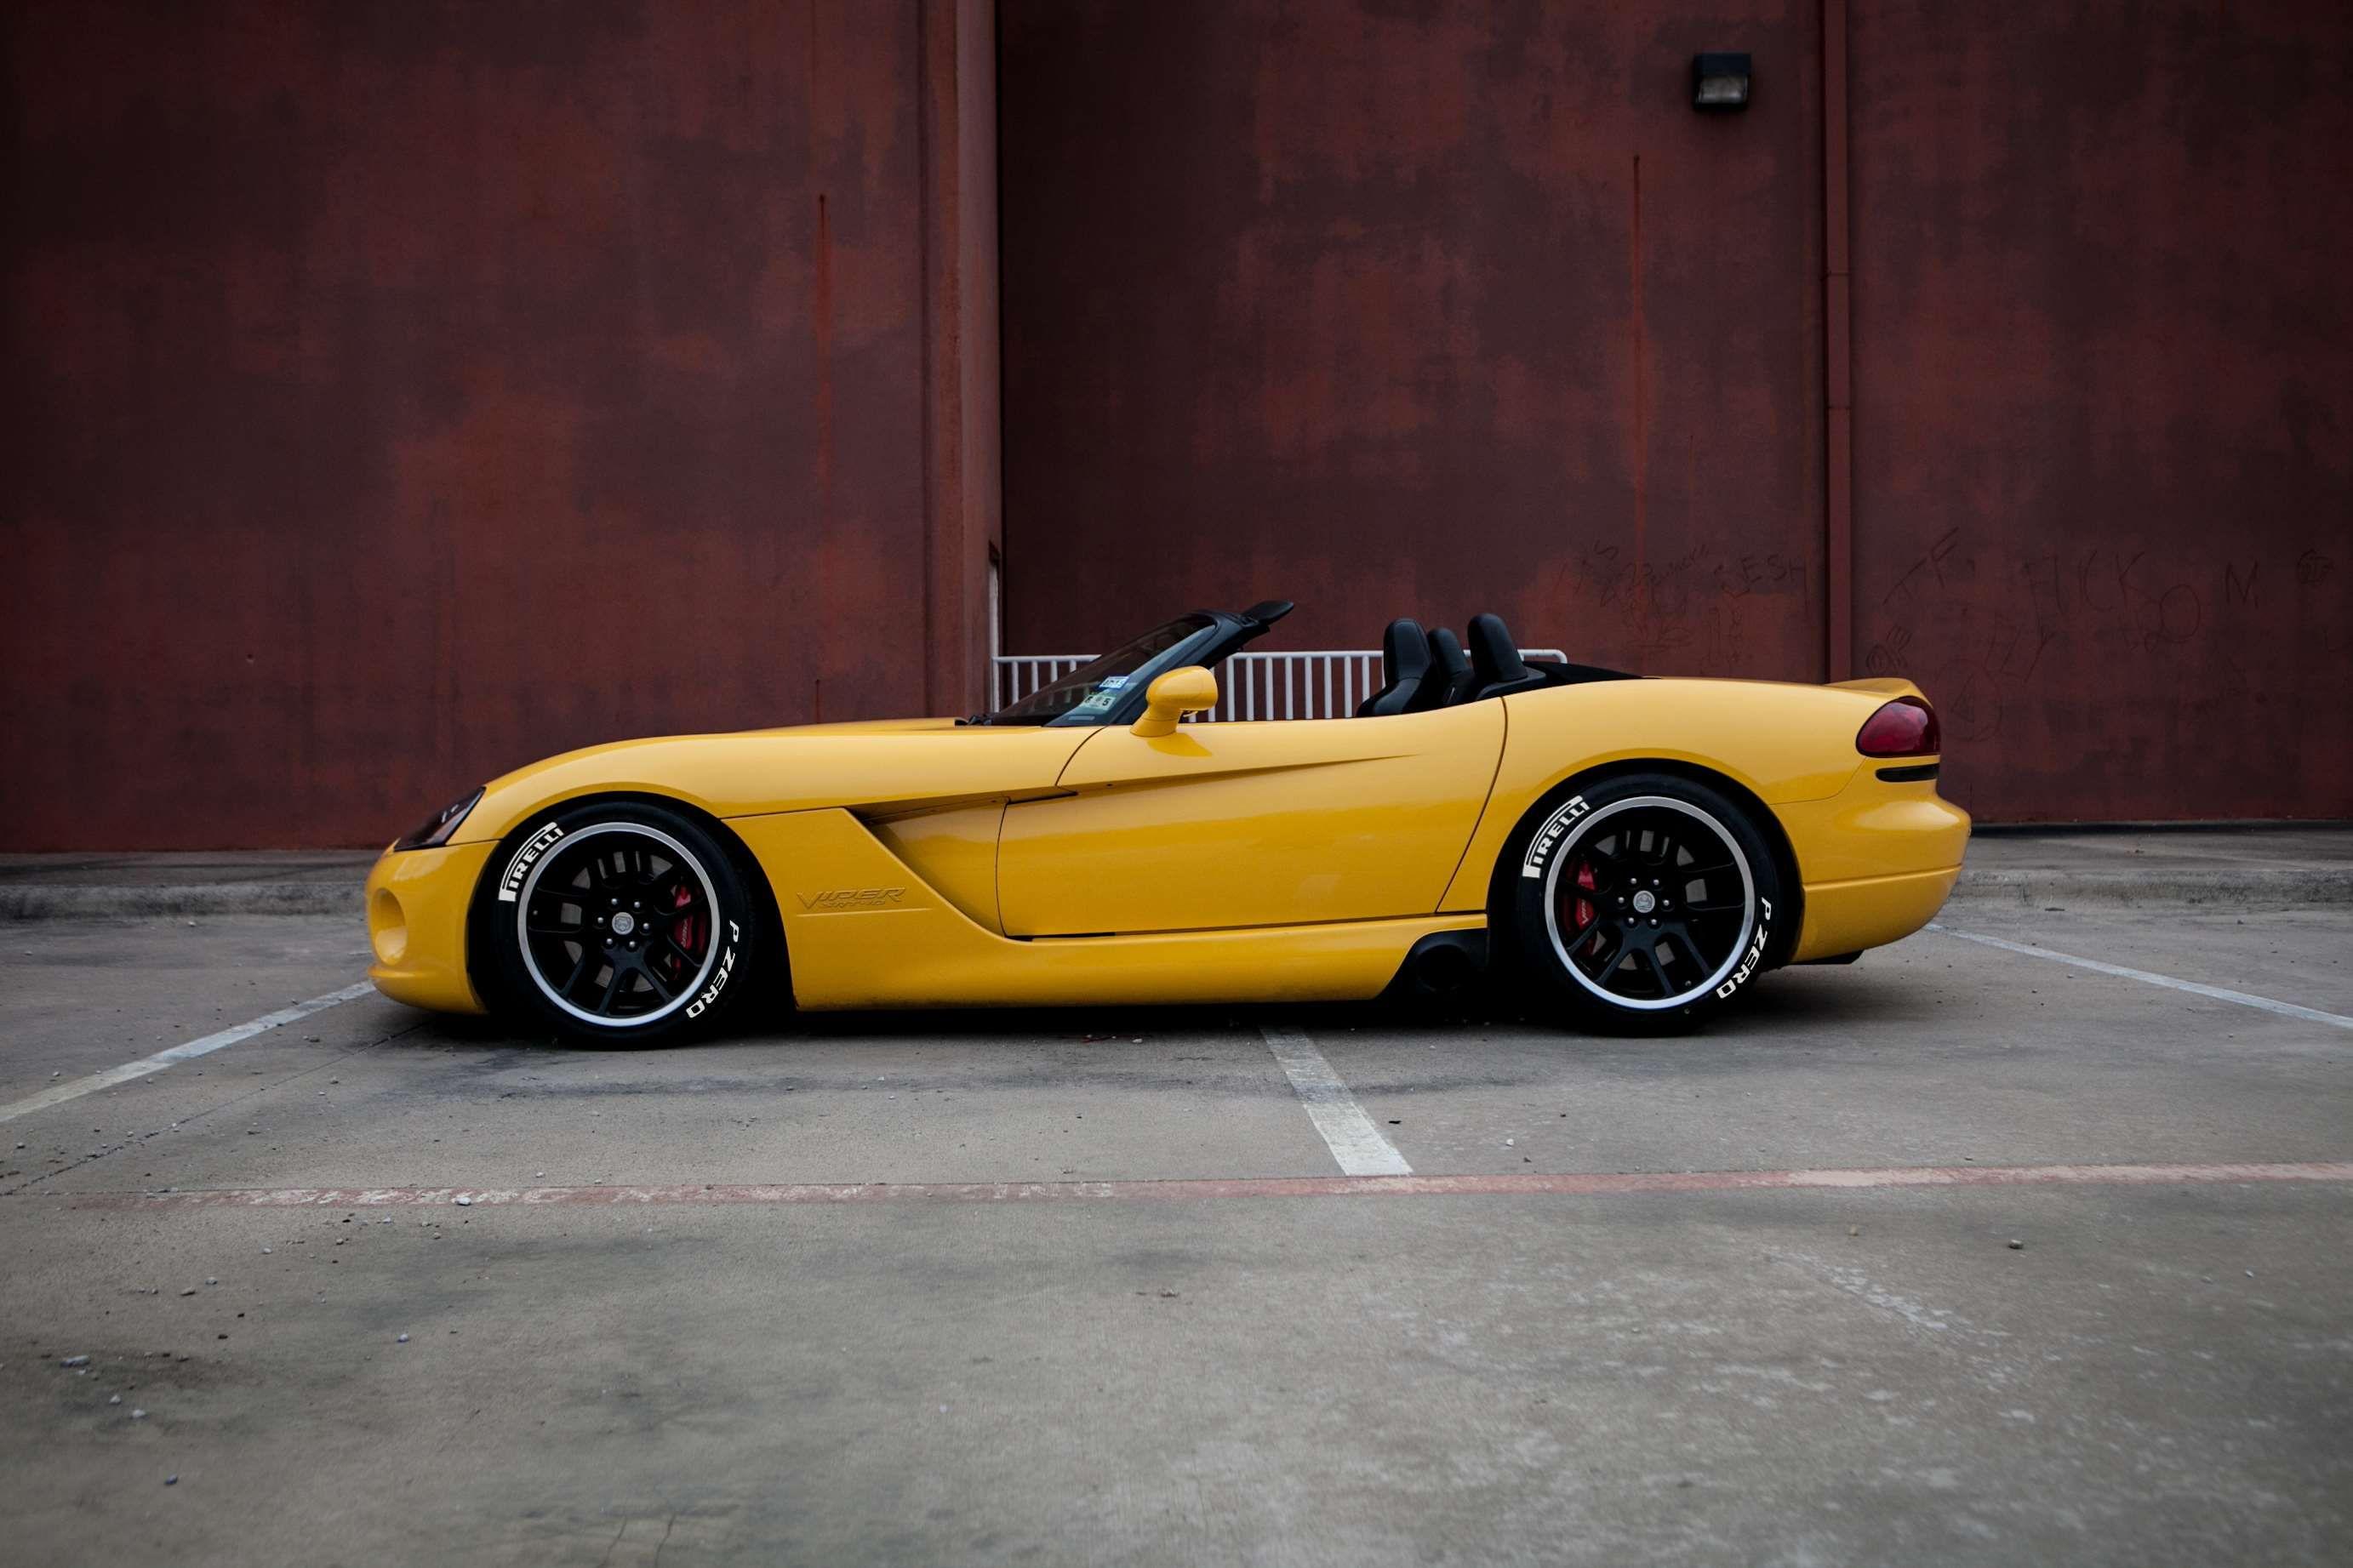 Car Dodge Viper Sports Car Viper Yellow Car Yellow Dodge